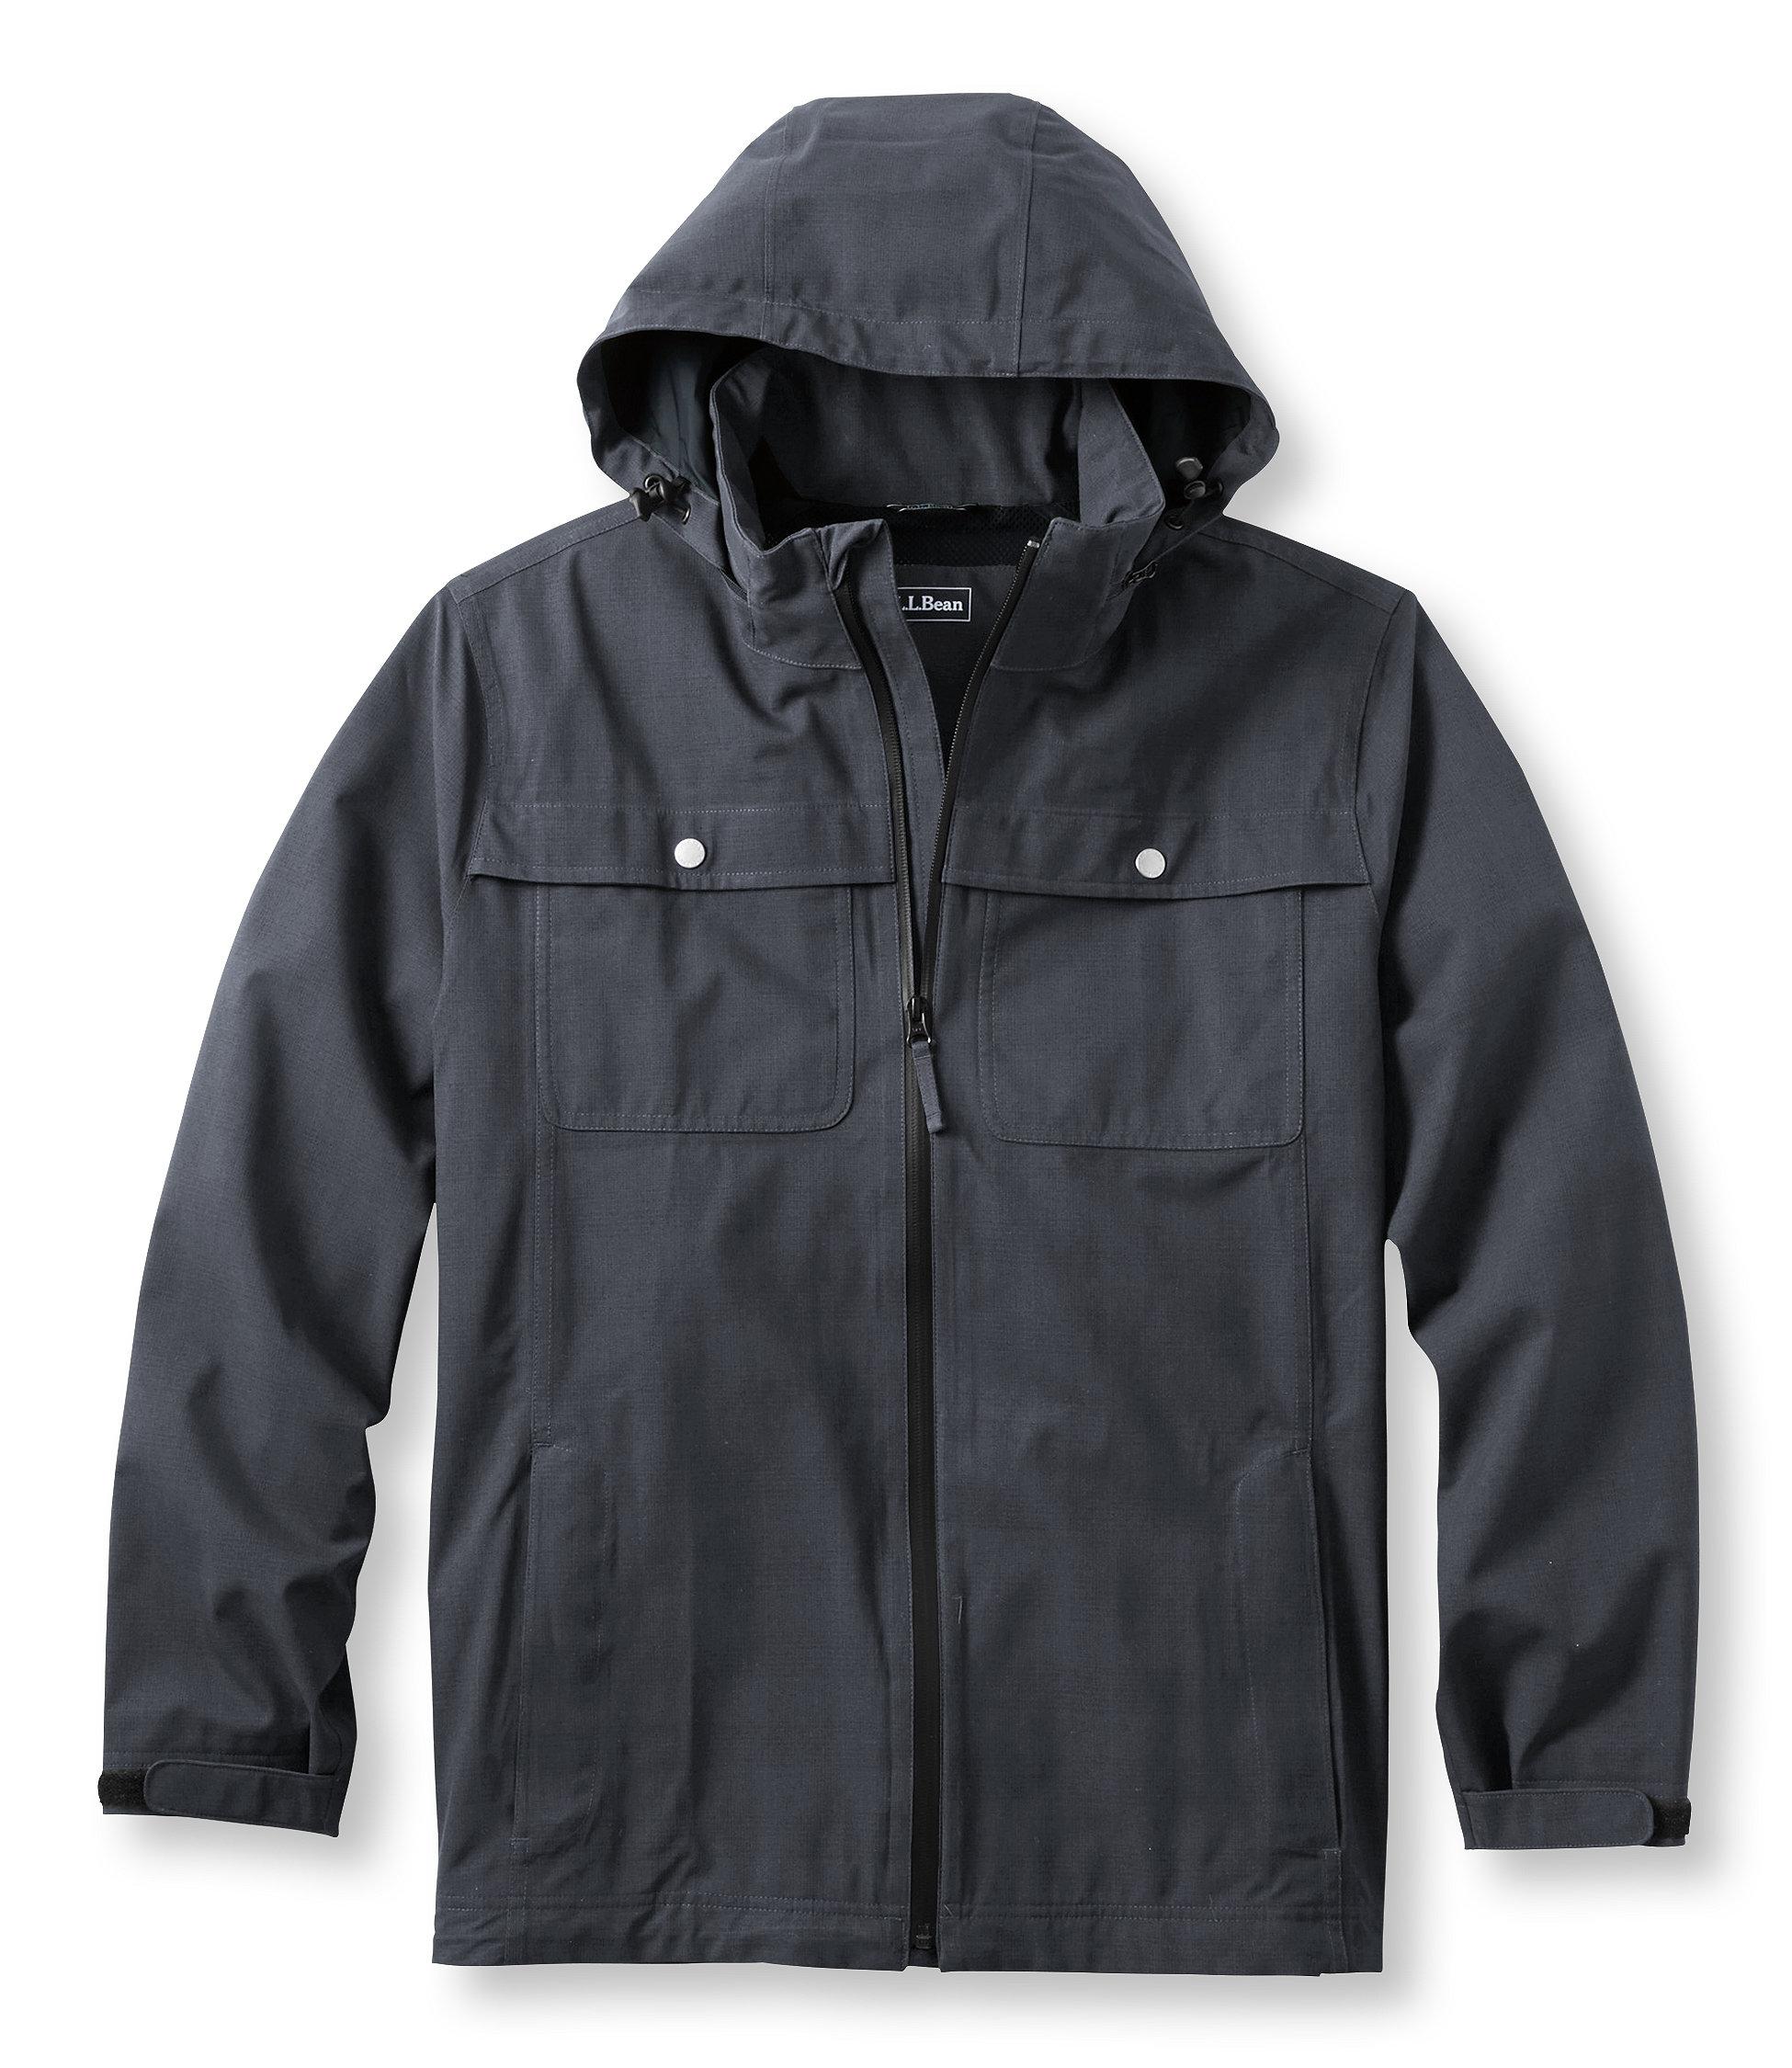 L.L.Bean Portlander Rain Jacket